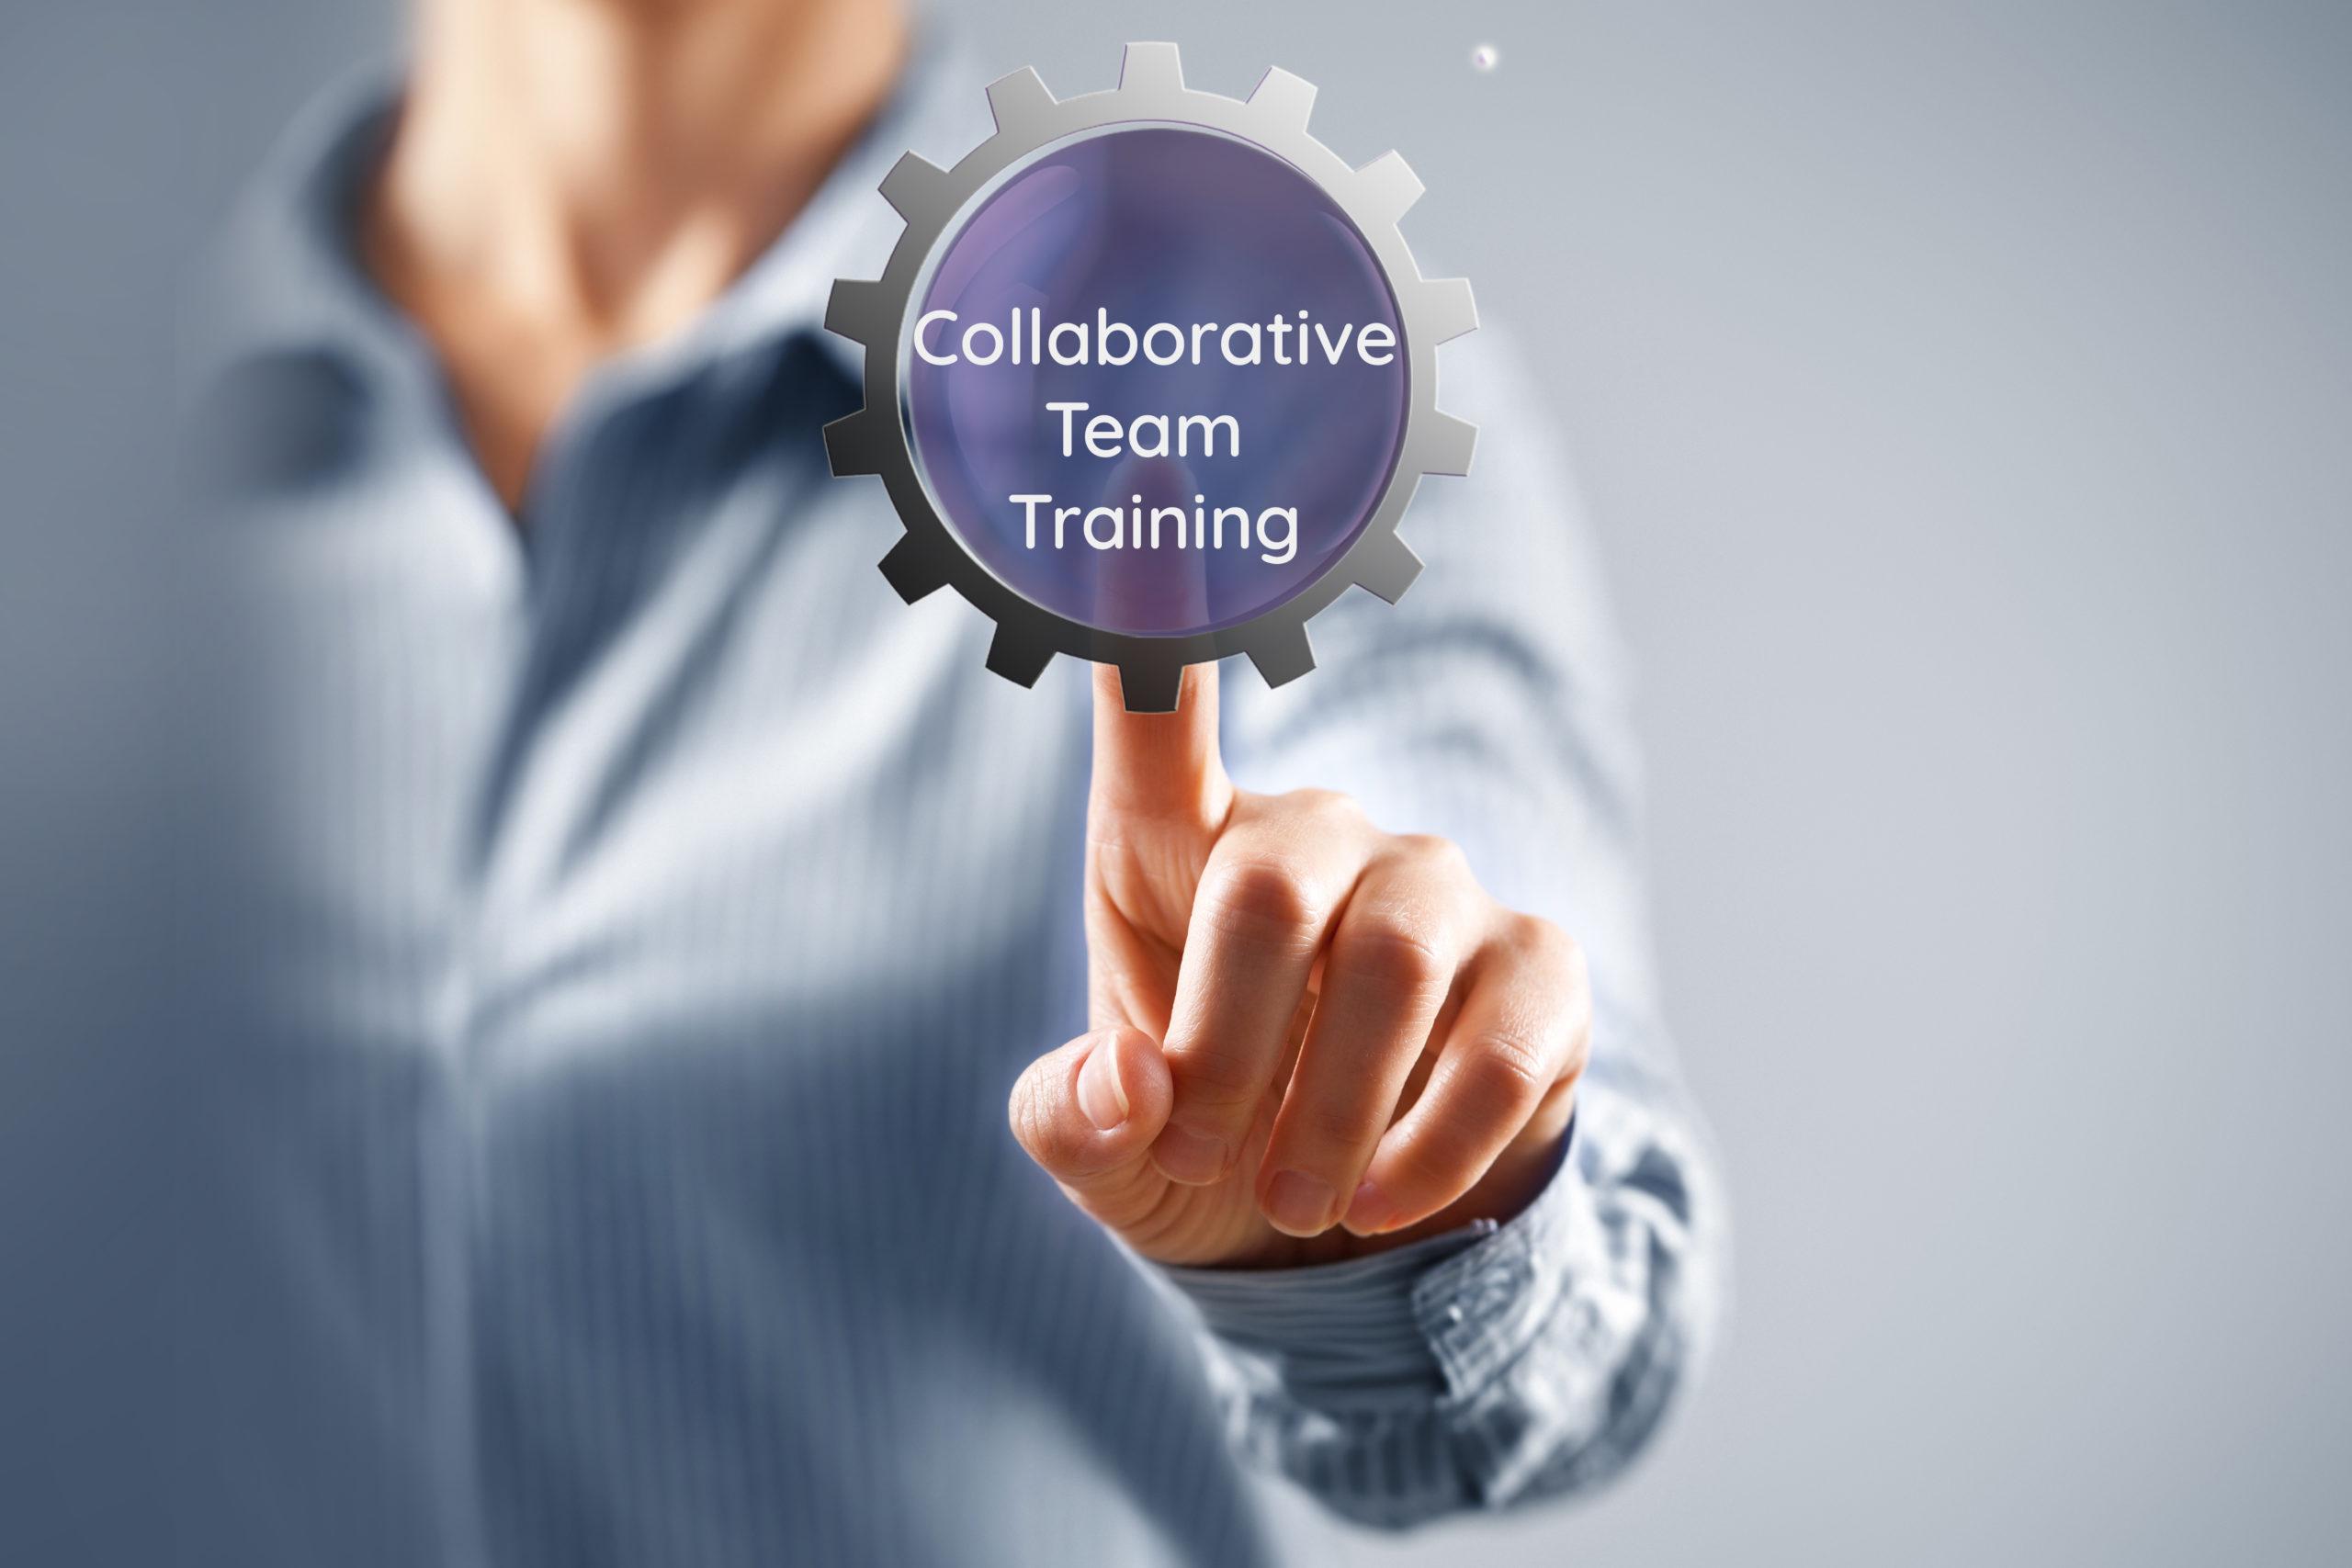 Collaborative Team Training